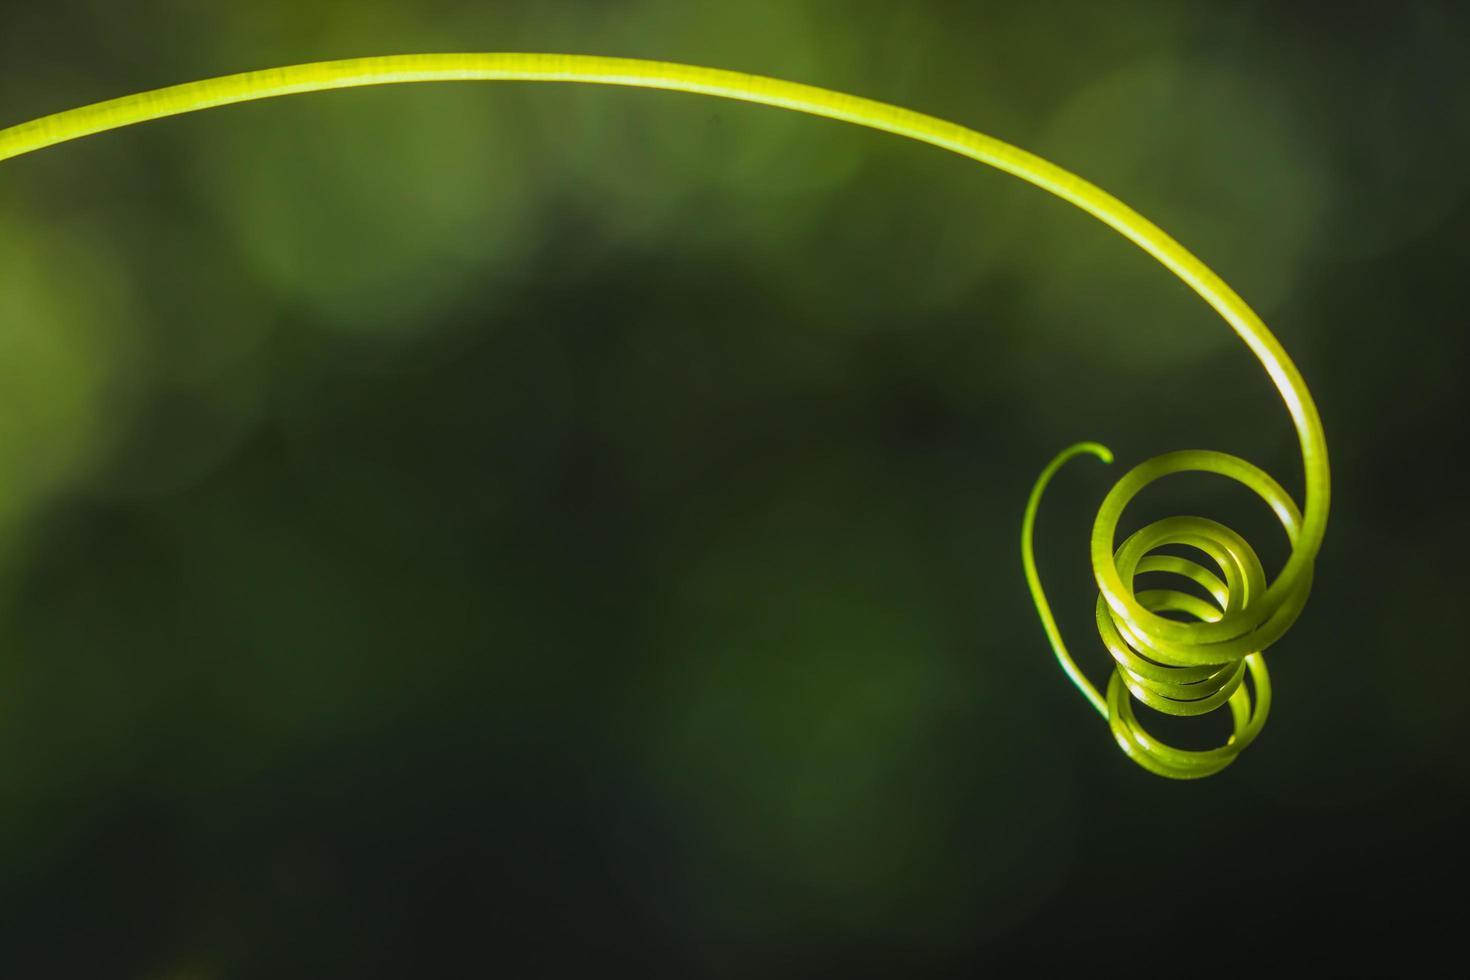 zucca baffi su sfondo verde foto